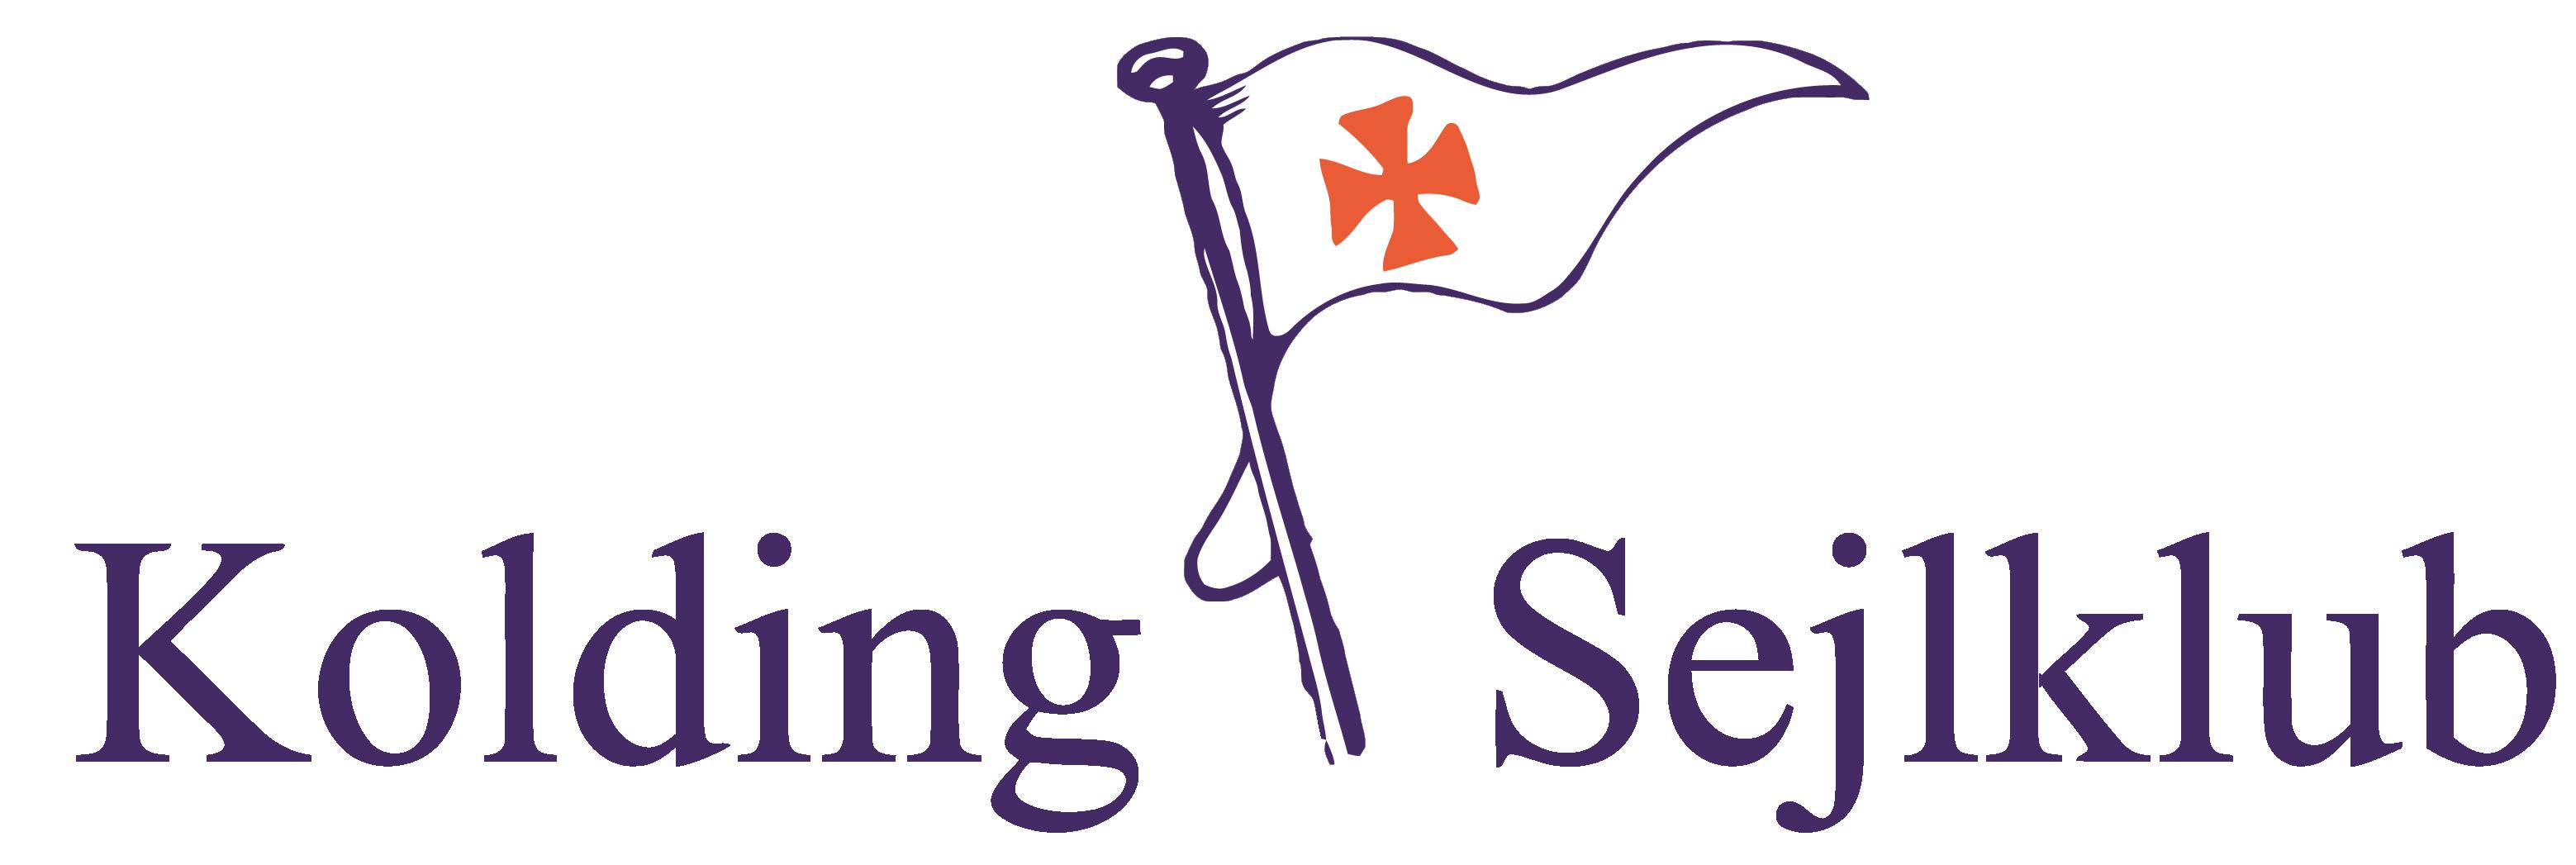 Kolding Sejlklub logo